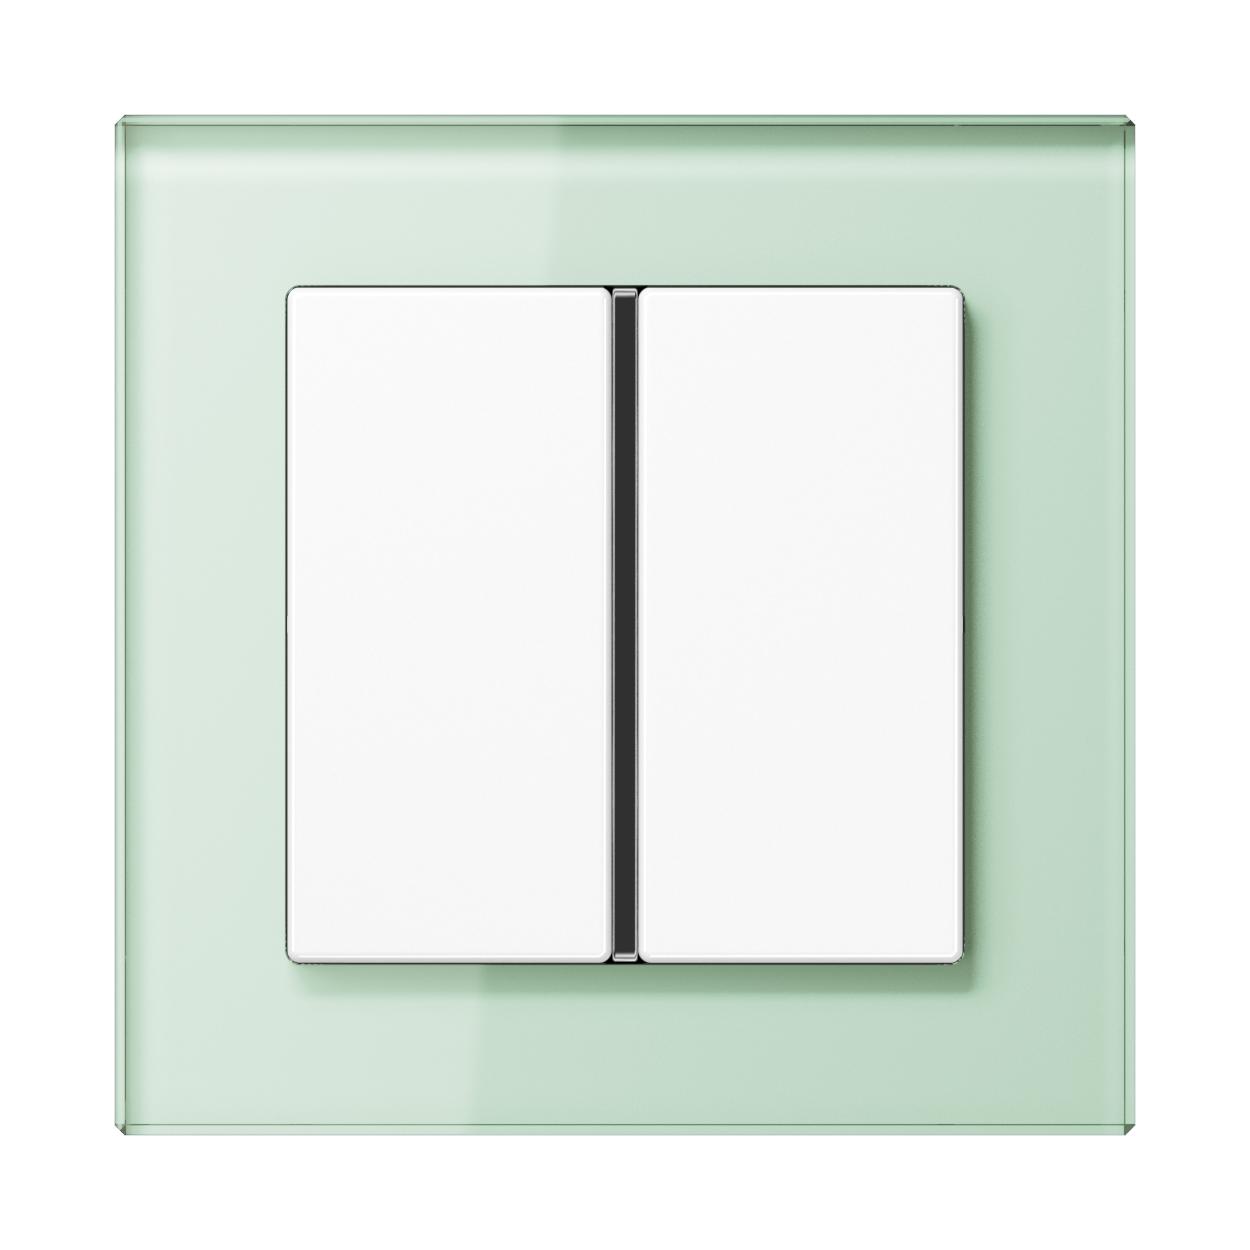 JUNG_AC_GL_soft-white_1button